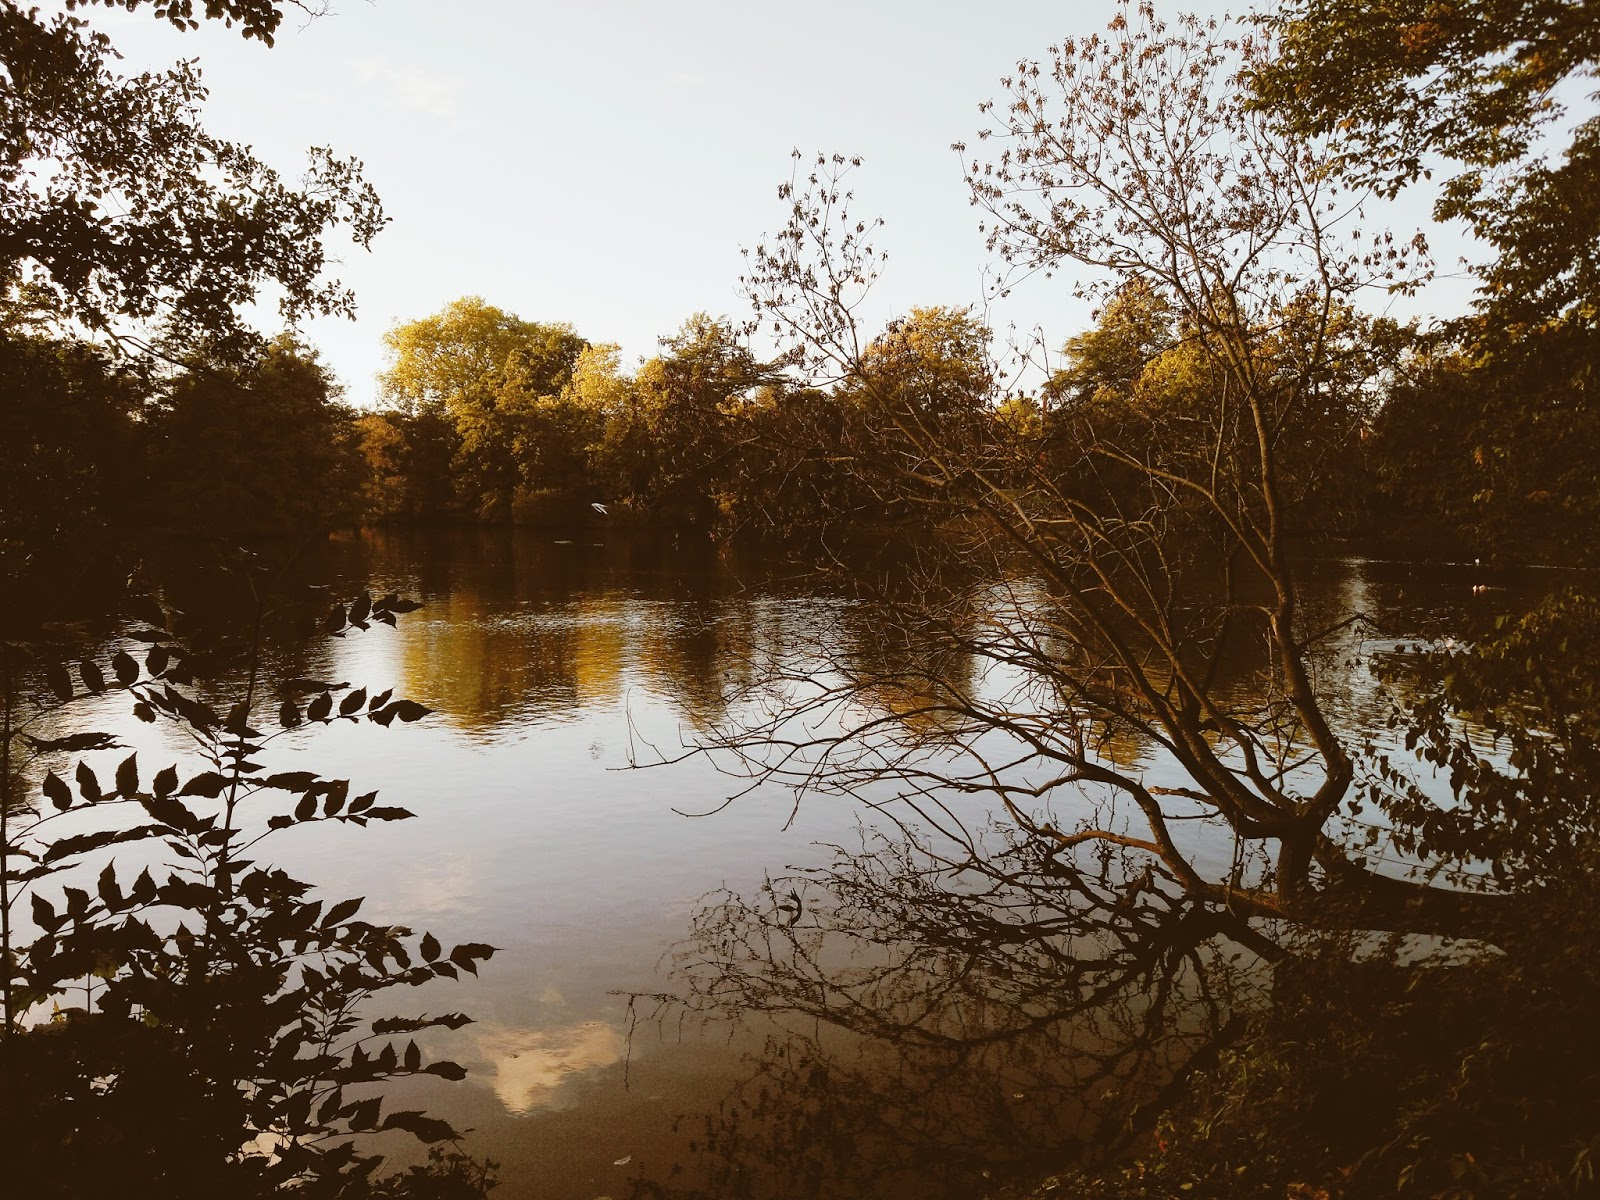 lebellelavie - A weekend in Reading